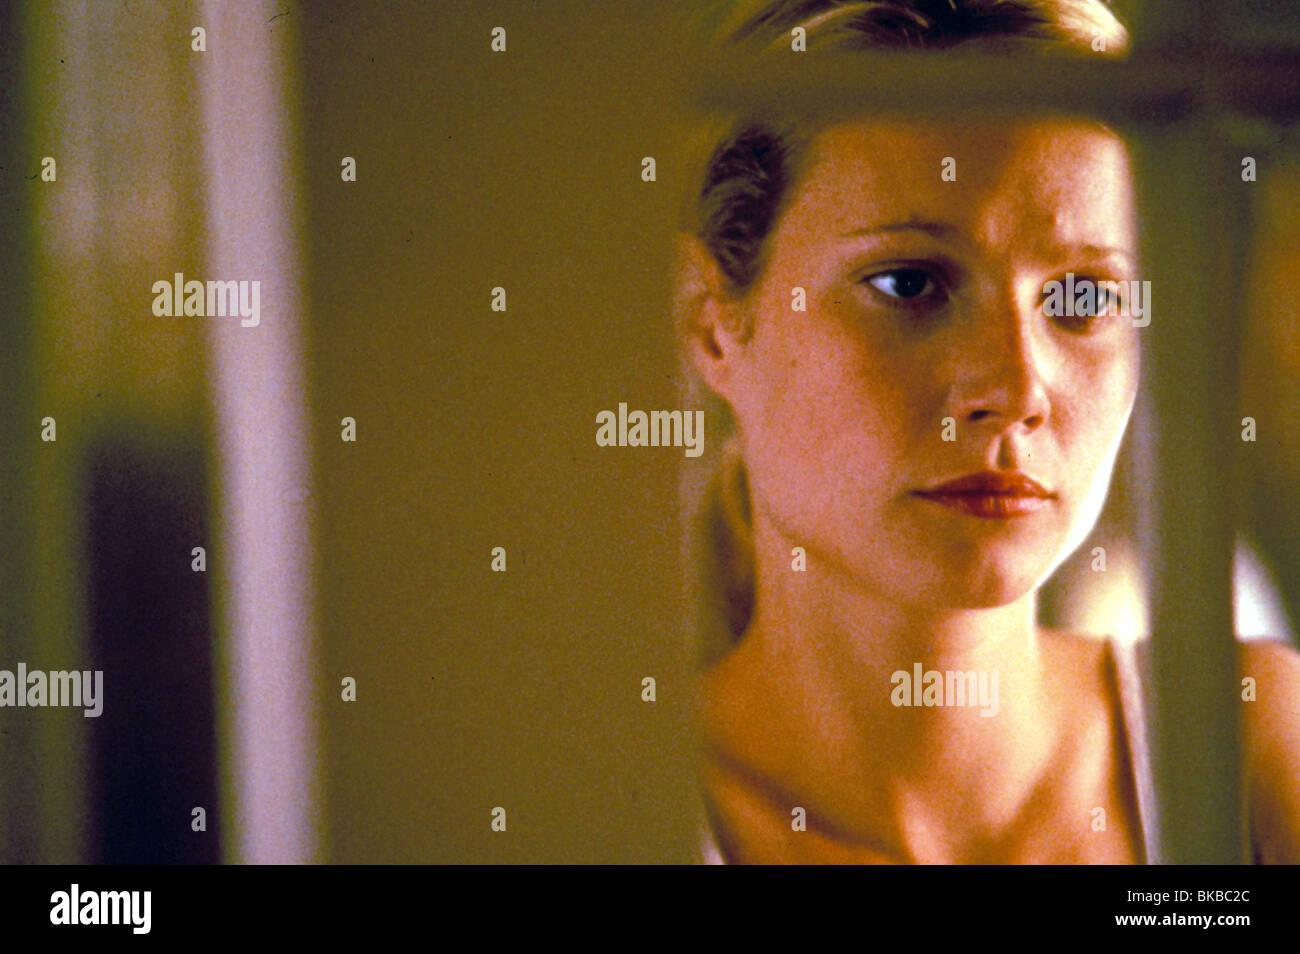 Sette -1995 Gwyneth Paltrow Immagini Stock